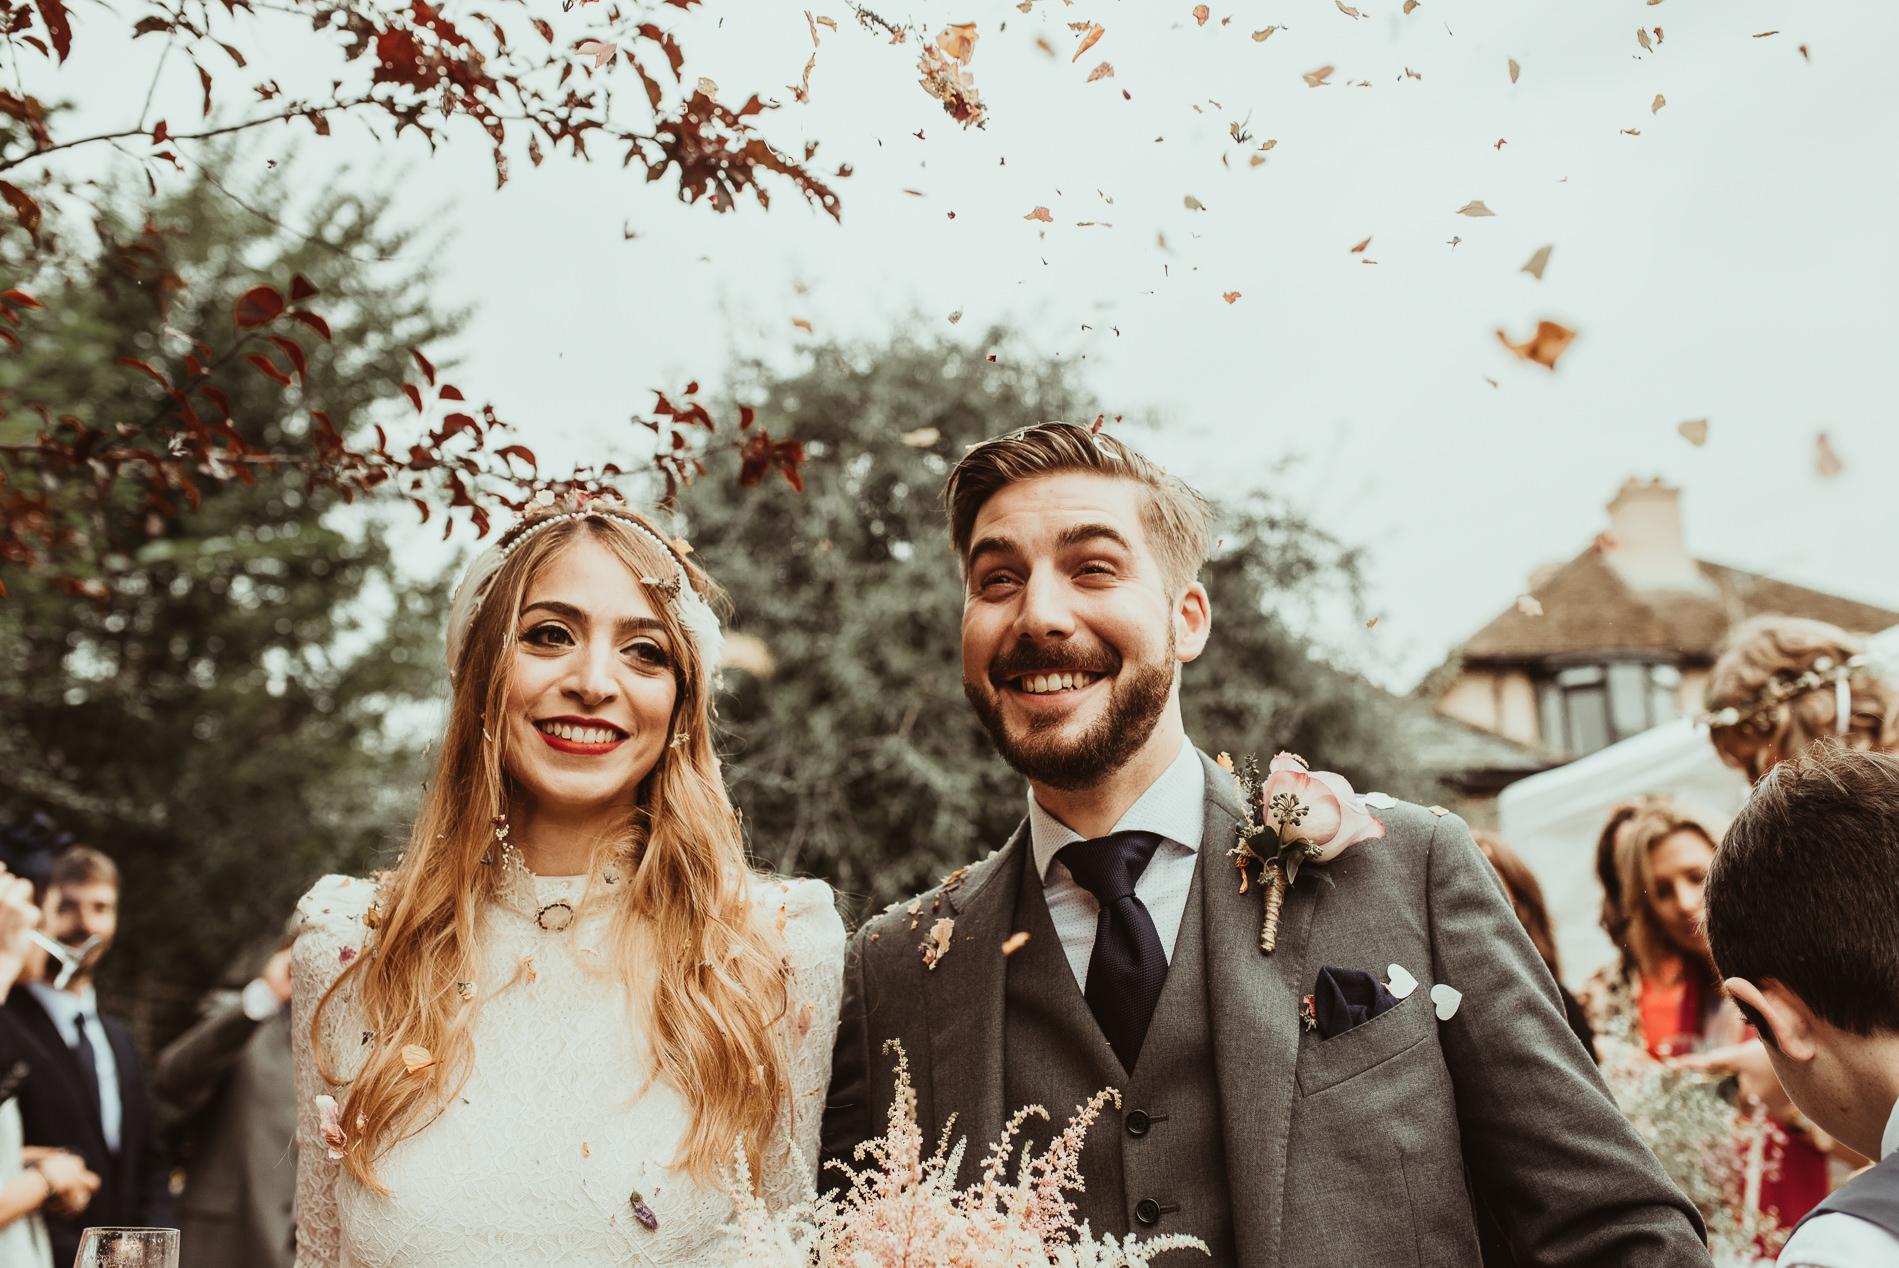 bohemian_wedding_lawshall_church_garden52